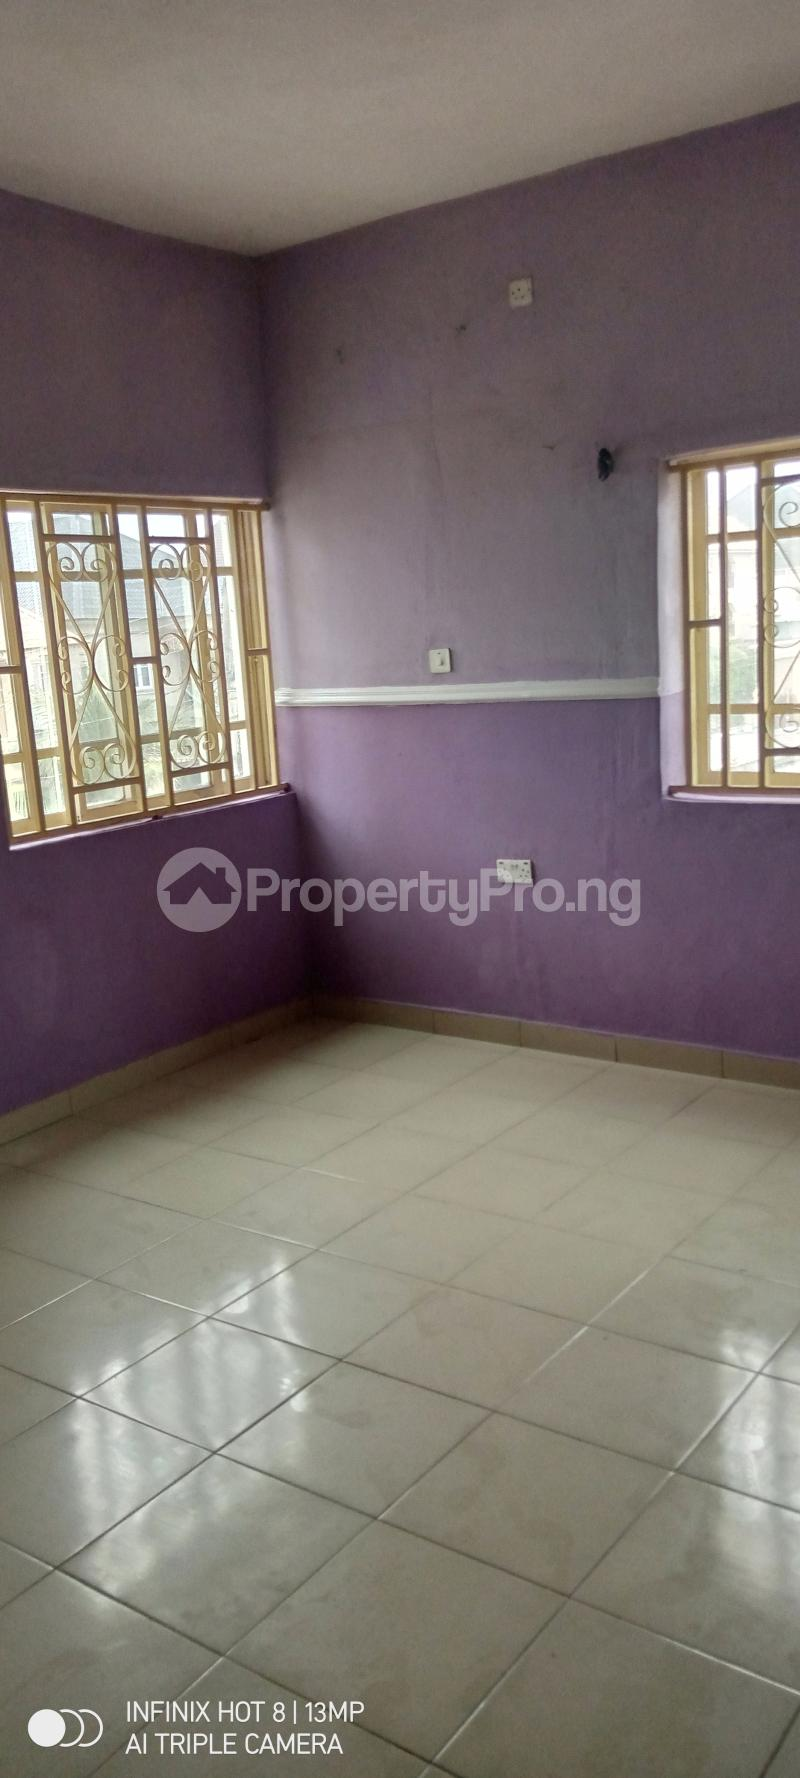 3 bedroom Flat / Apartment for rent Green field estate Amuwo Odofin Amuwo Odofin Lagos - 0